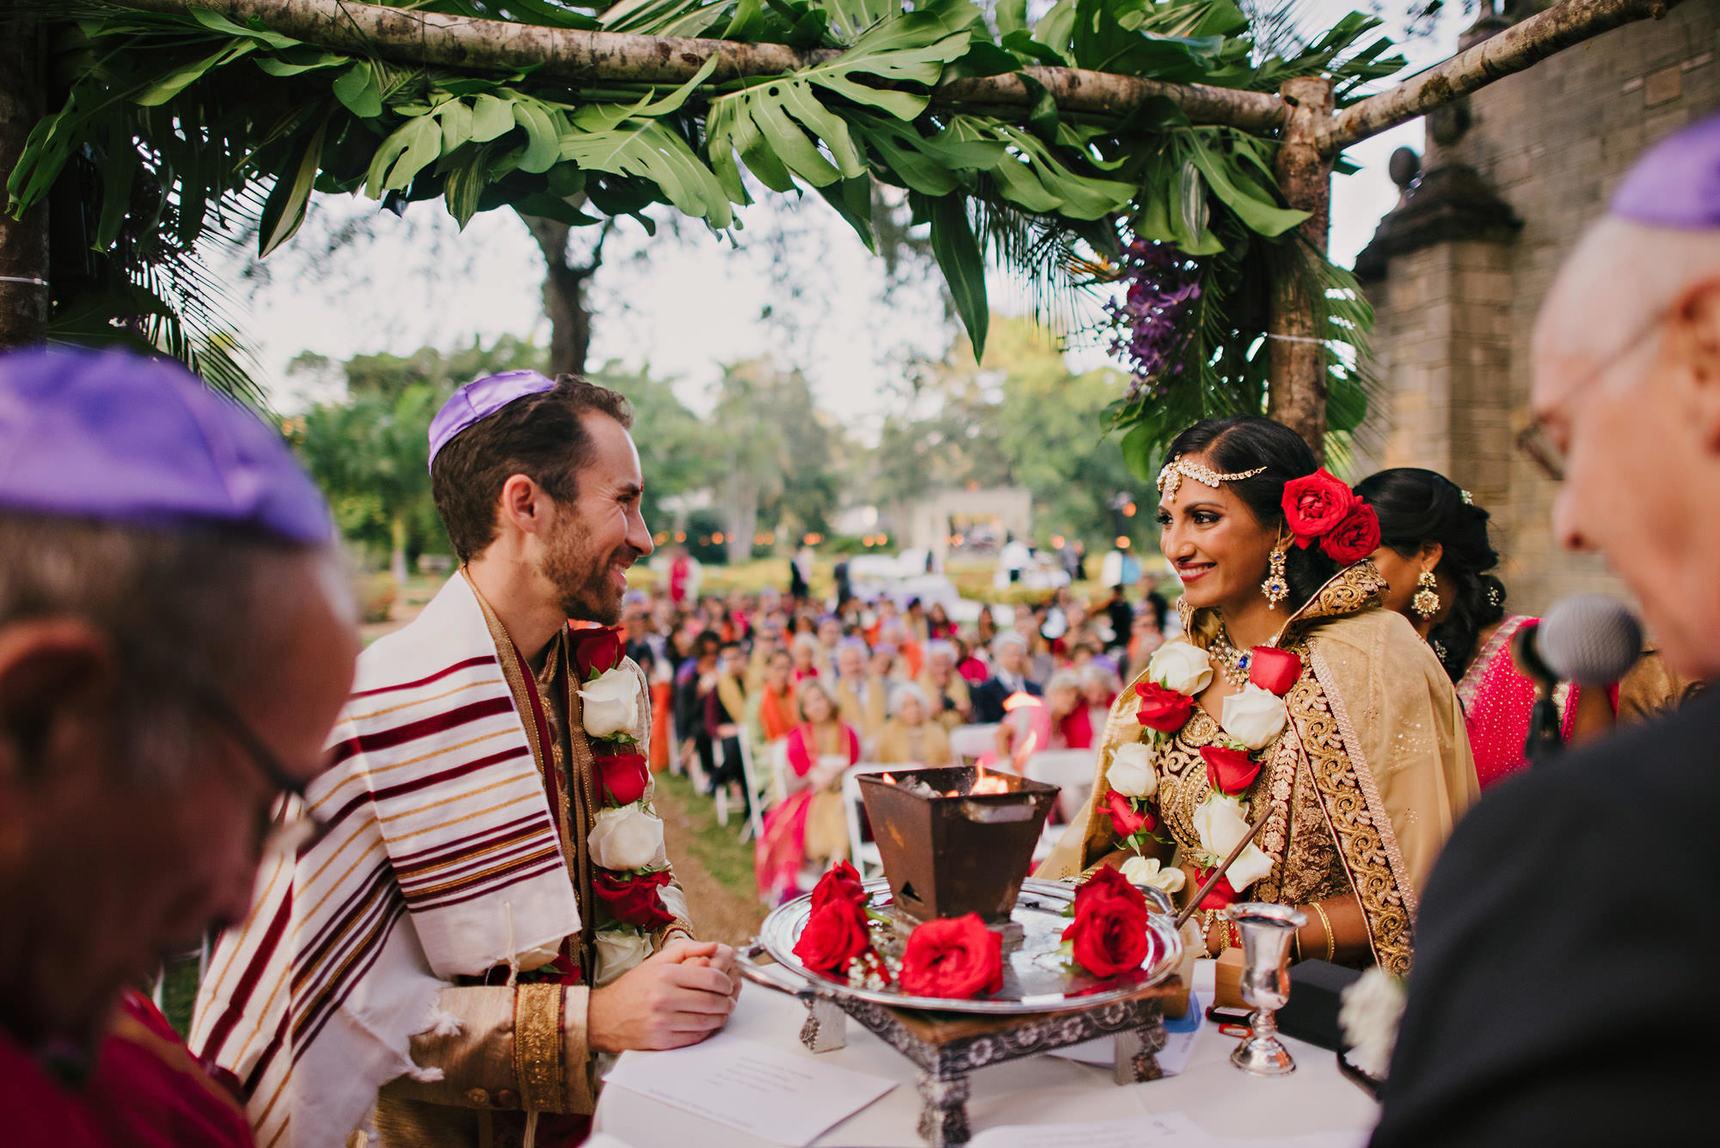 miami-luxury-catering-Wedding-Photography-71(pp_w1720_h1148).jpg